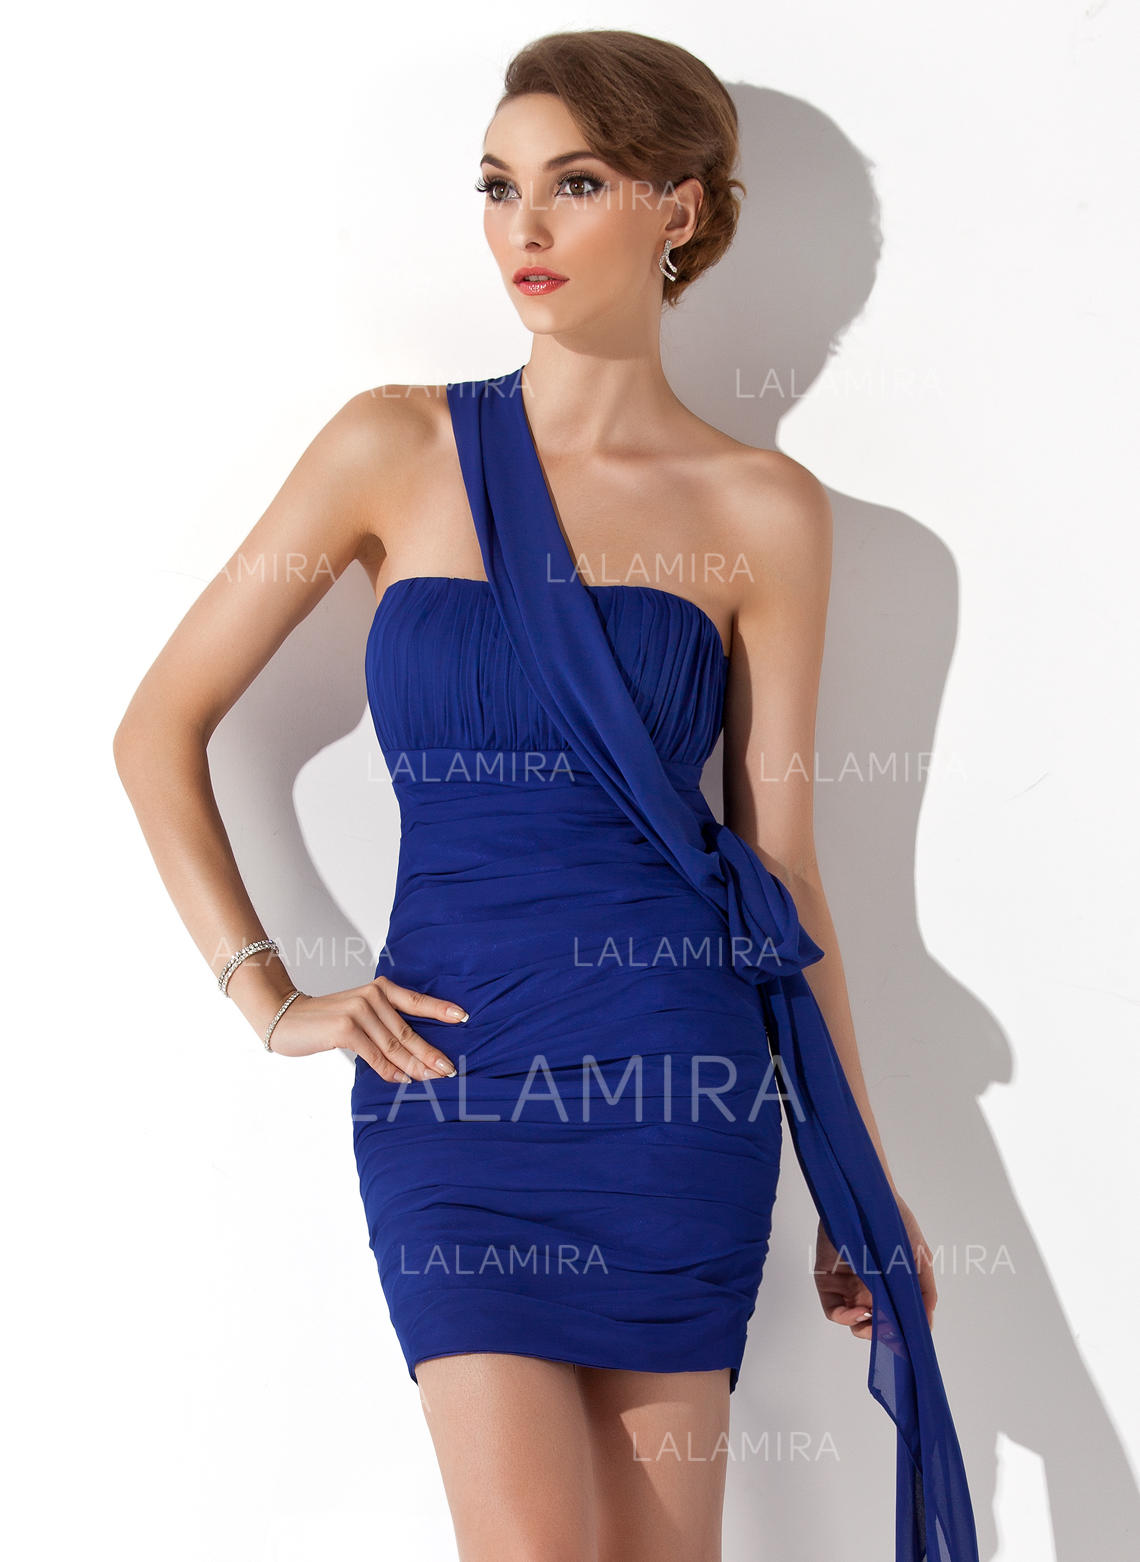 68d2432f3831 Sheath/Column Chiffon Prom Dresses Ruffle One-Shoulder Sleeveless  Short/Mini (018135282. Loading zoom